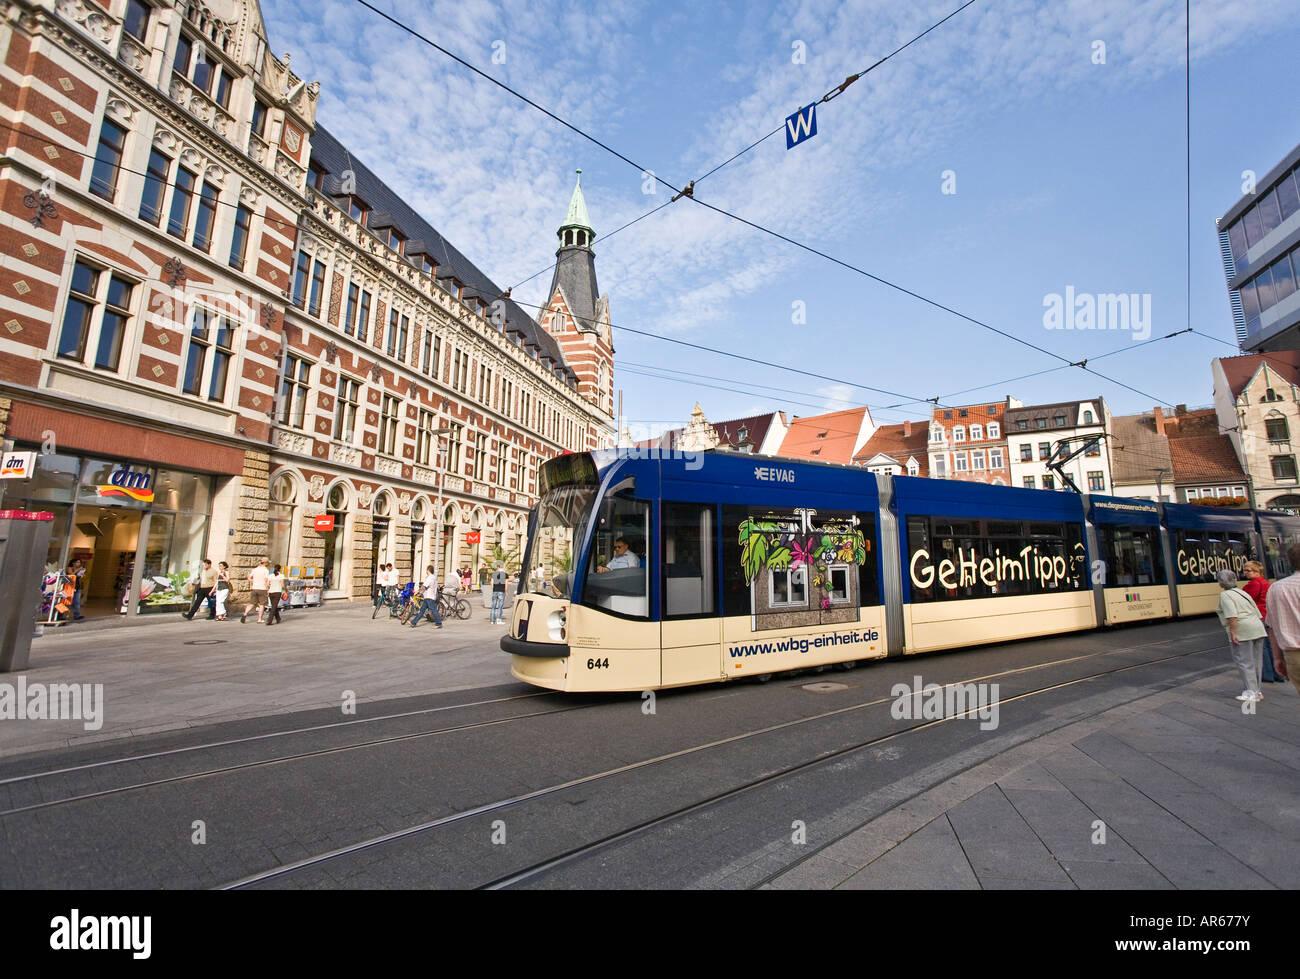 Streetcar downtown Erfurt Germany - Stock Image